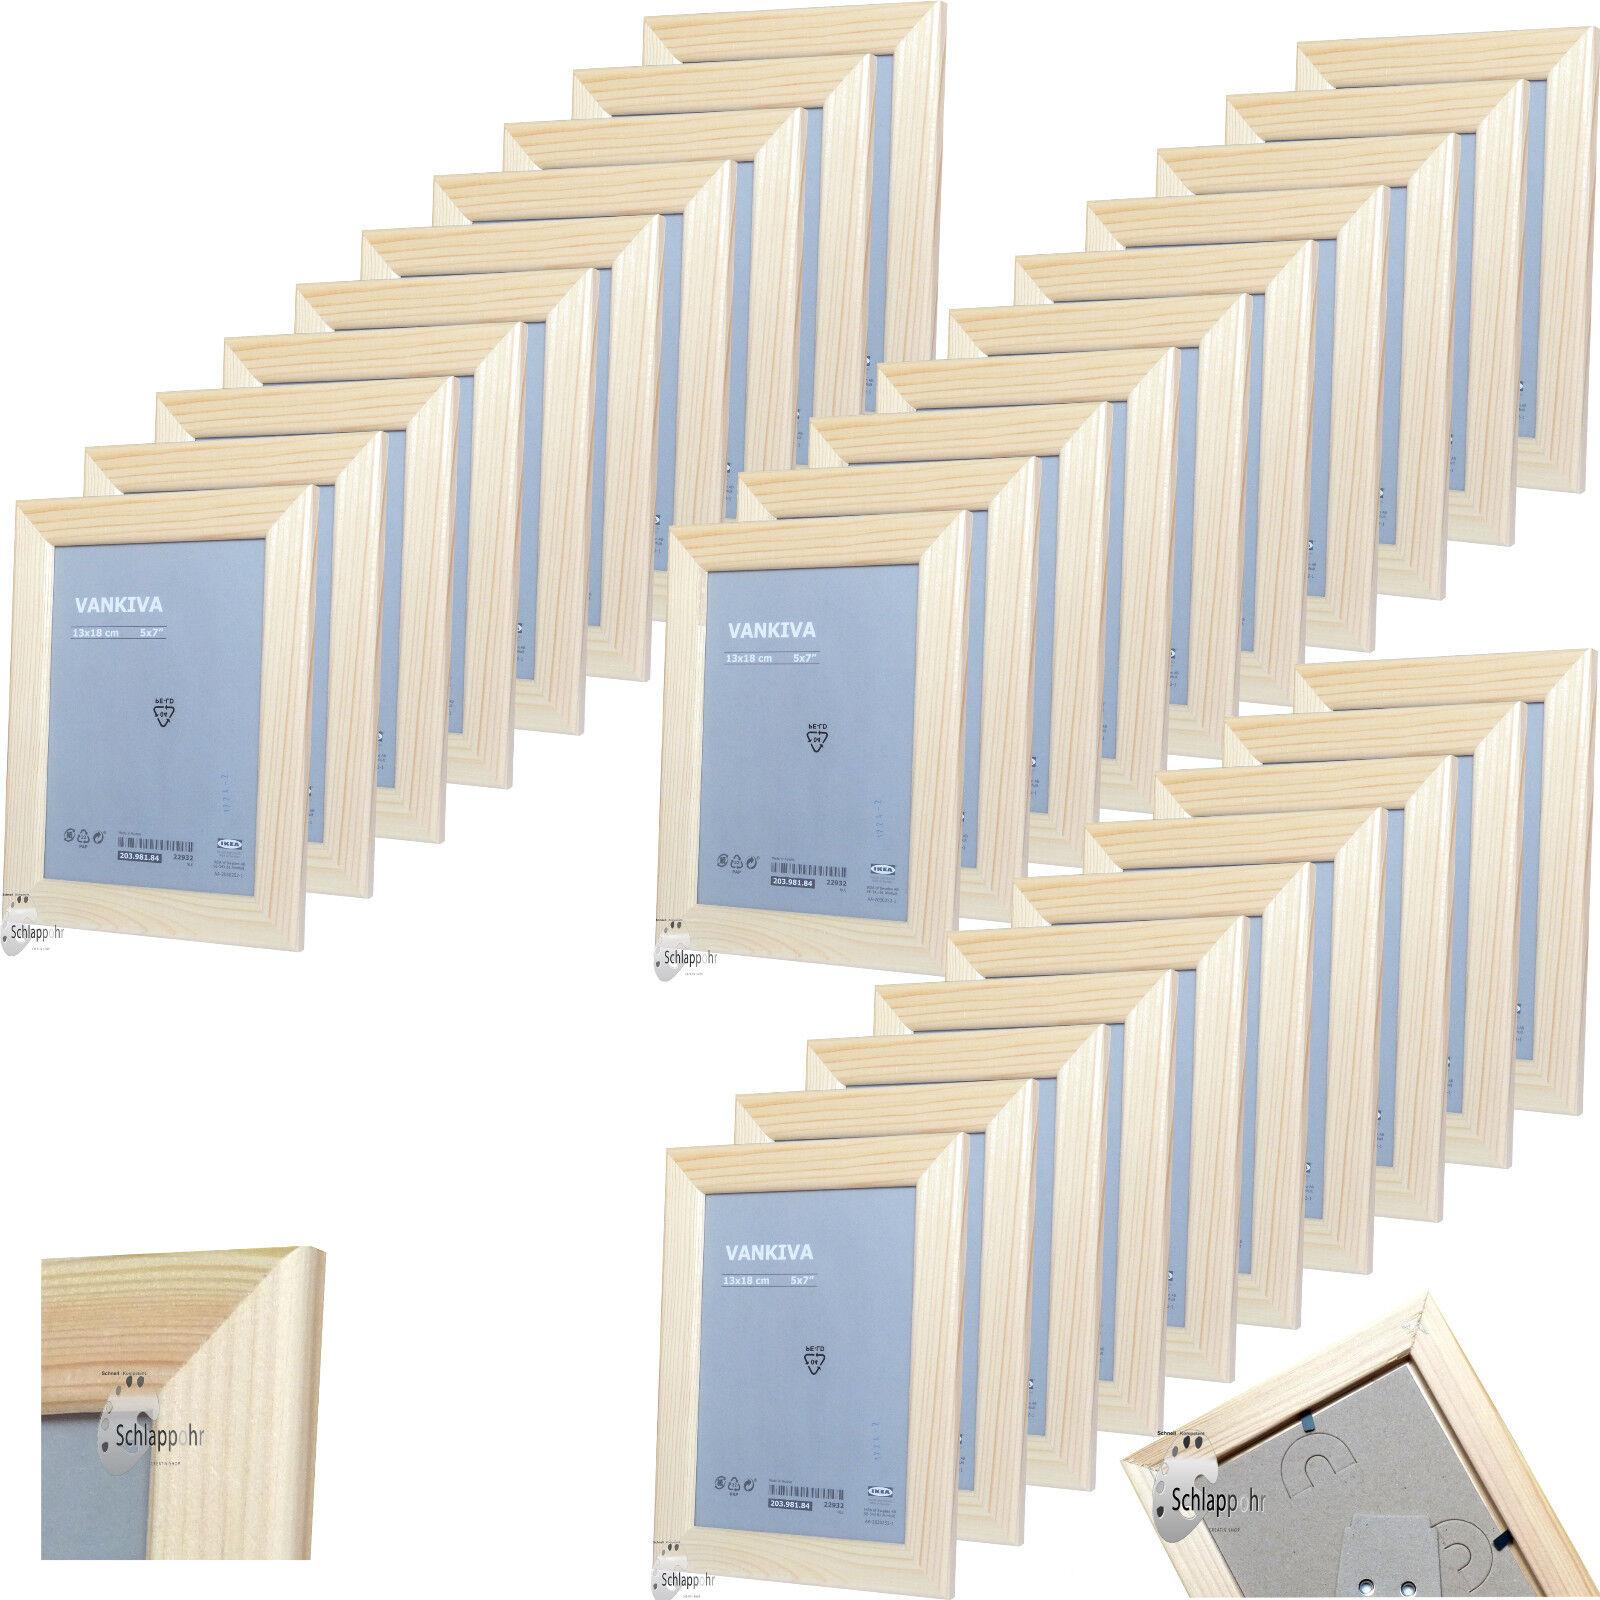 30-er Set IKEA VANKIVA 13x18 cm Kiefer Holz Foto.- Bilderrahmen Einrahmung Natur | Online Outlet Shop